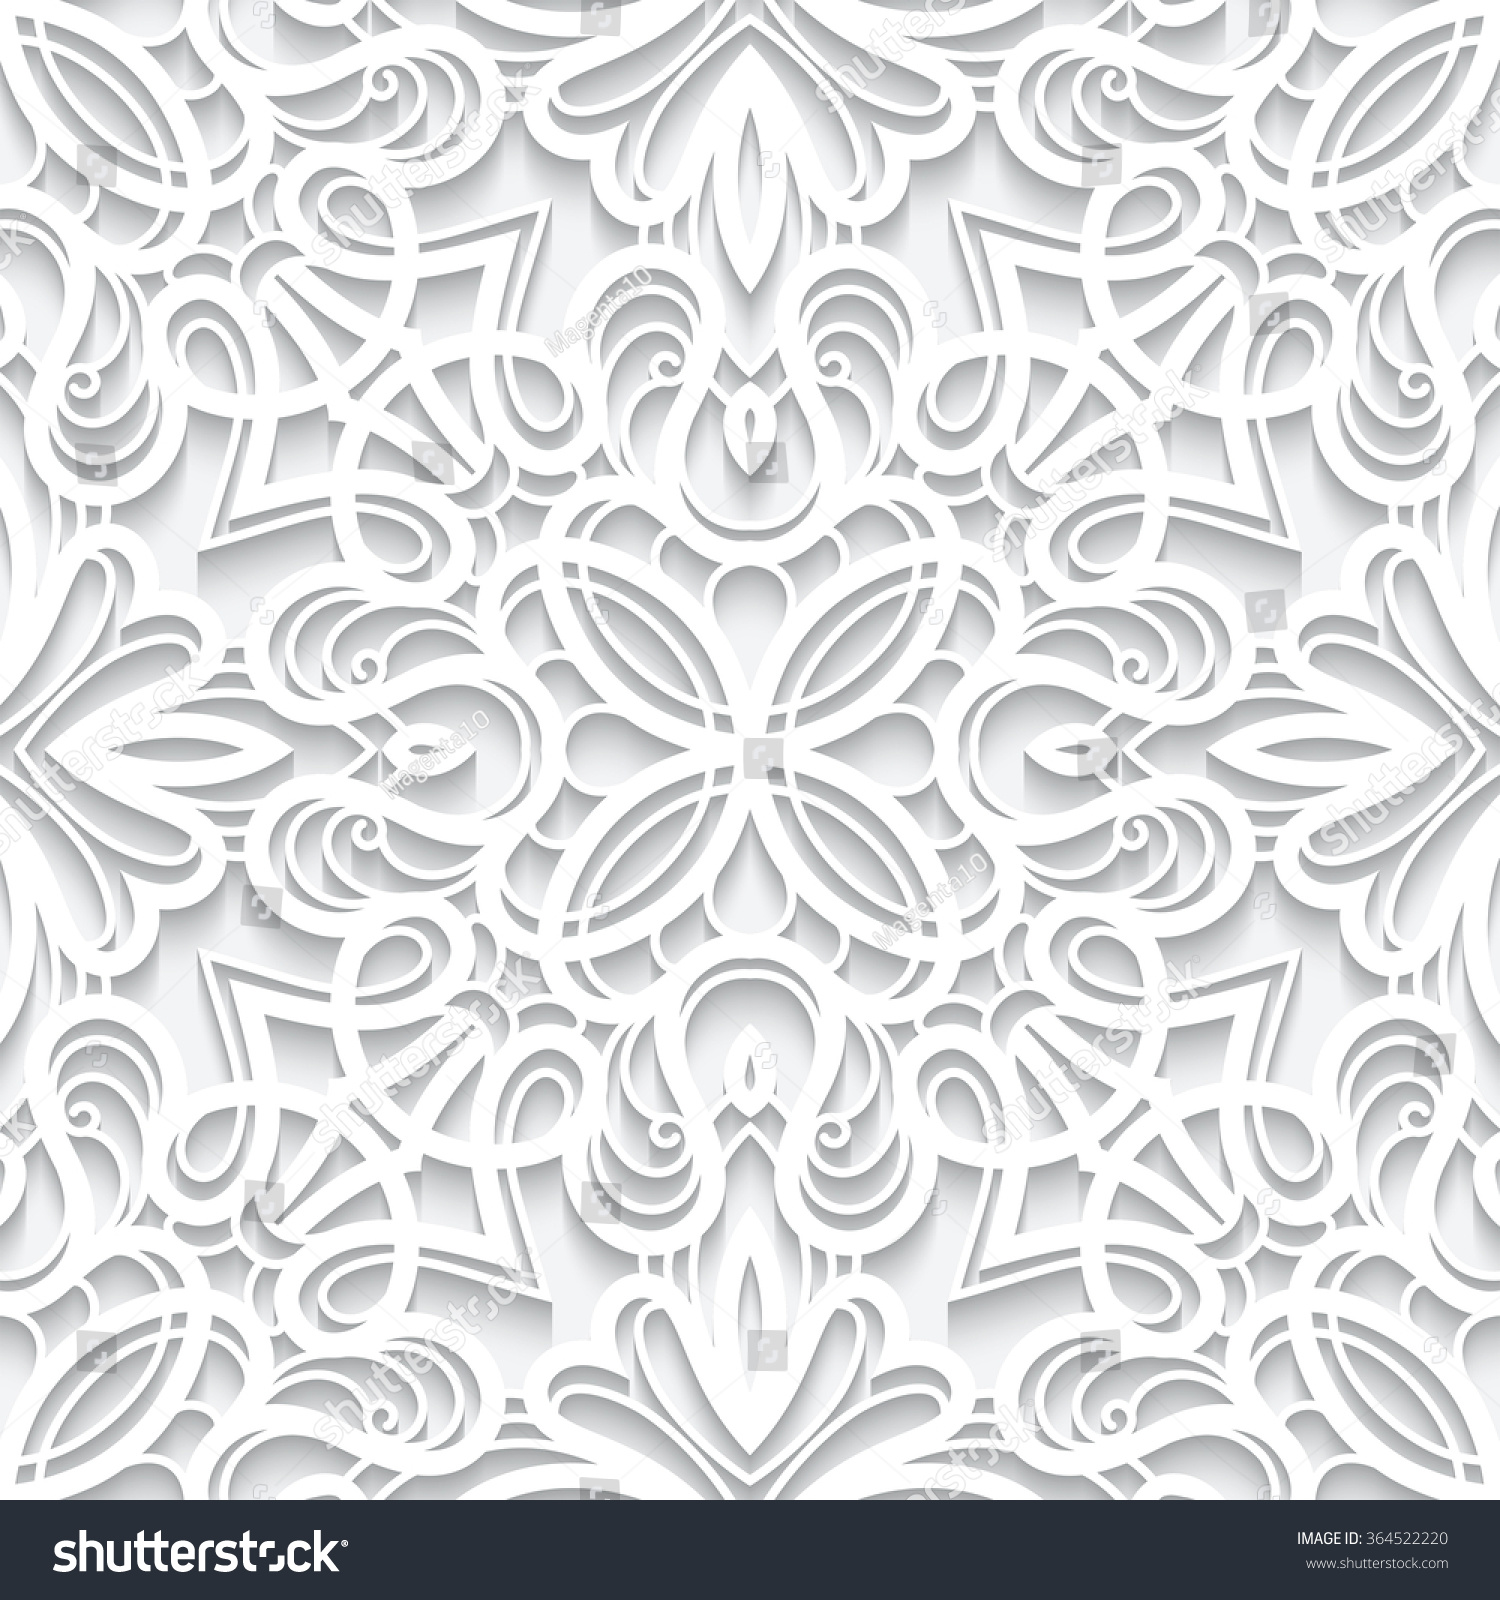 texture paper ornament - photo #21